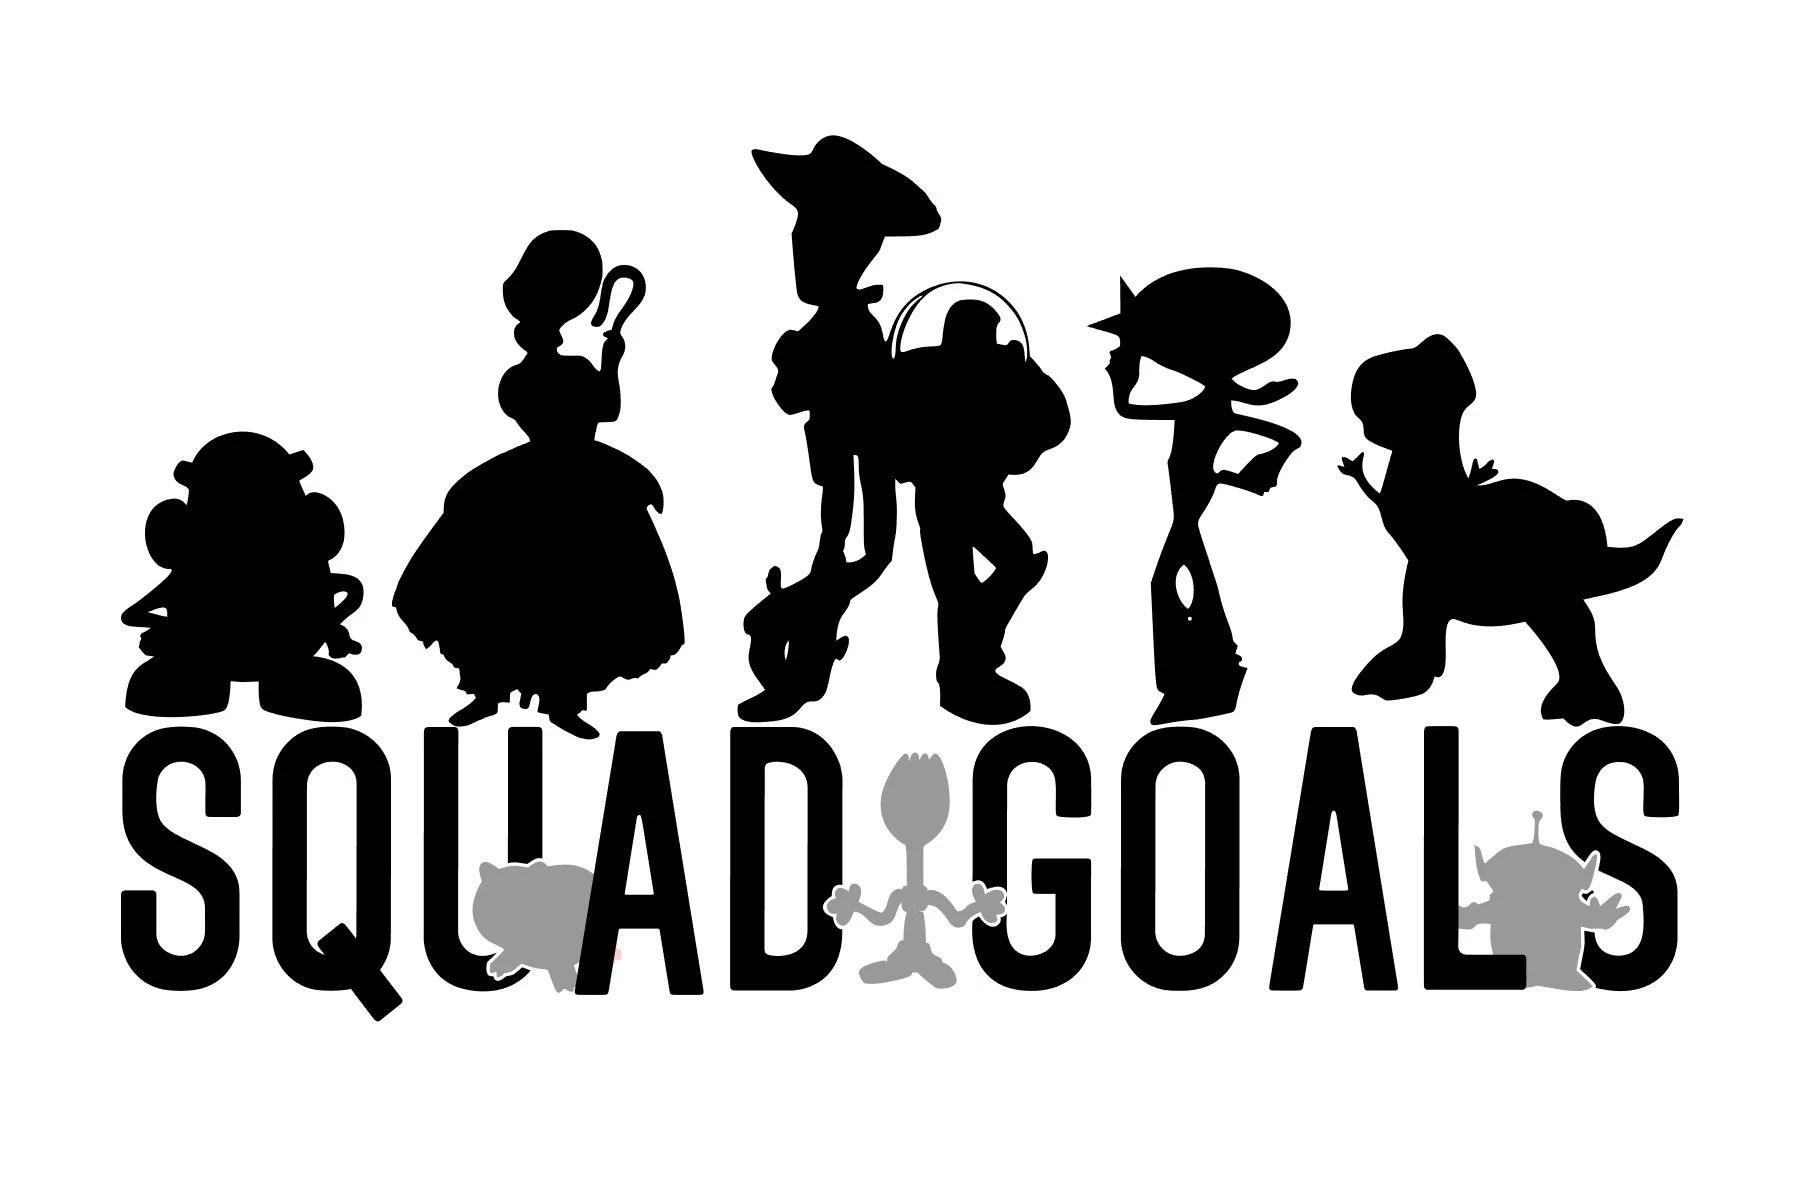 Toy Story 4 Svg Studio 3 Toy Story Squad Goals Svg